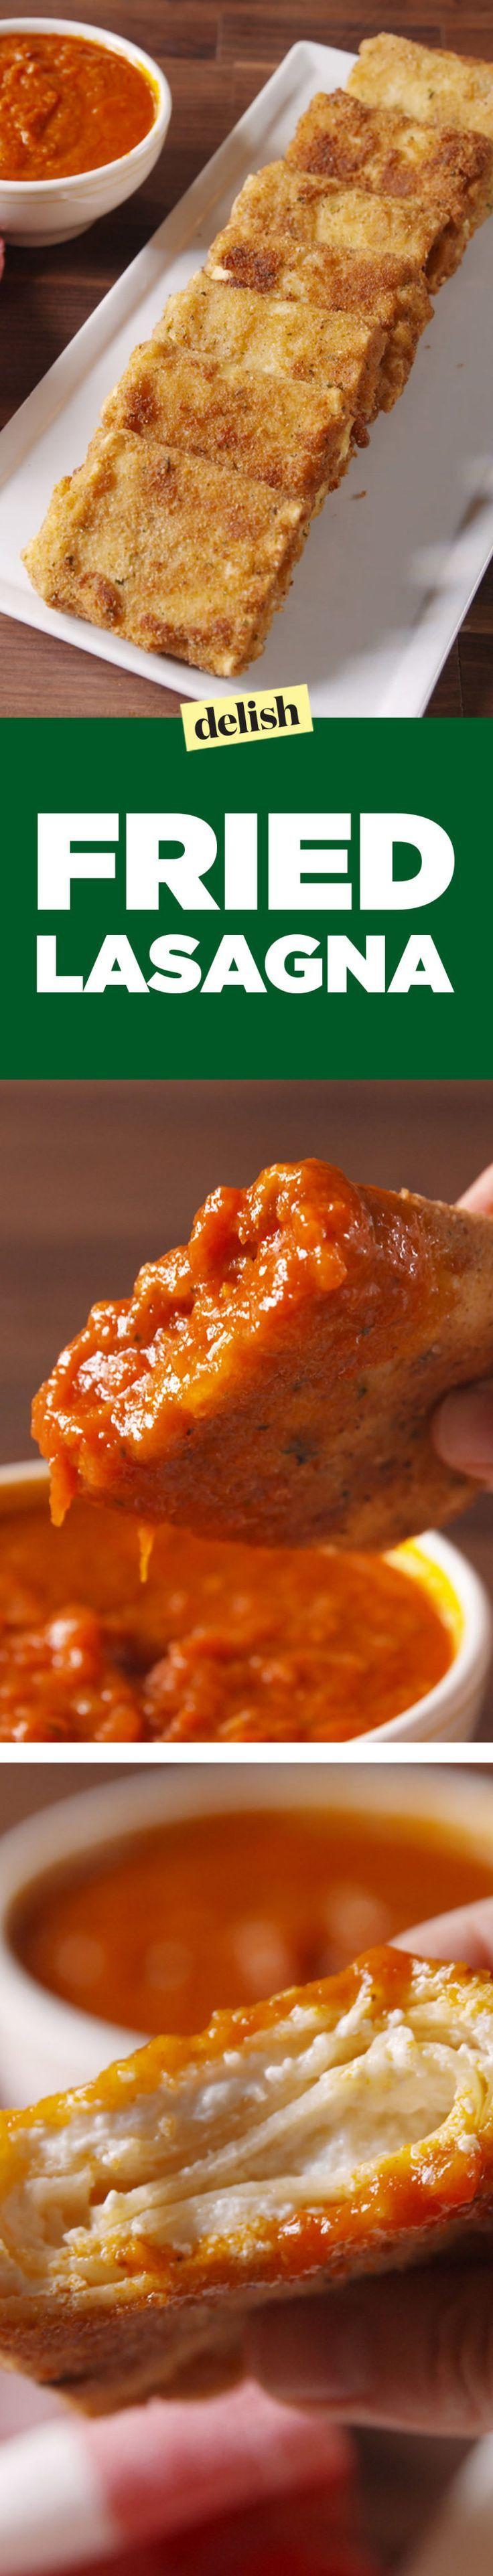 Our Fried Lasagna Slays Olive Garden's Whole Menu  - Delish.com